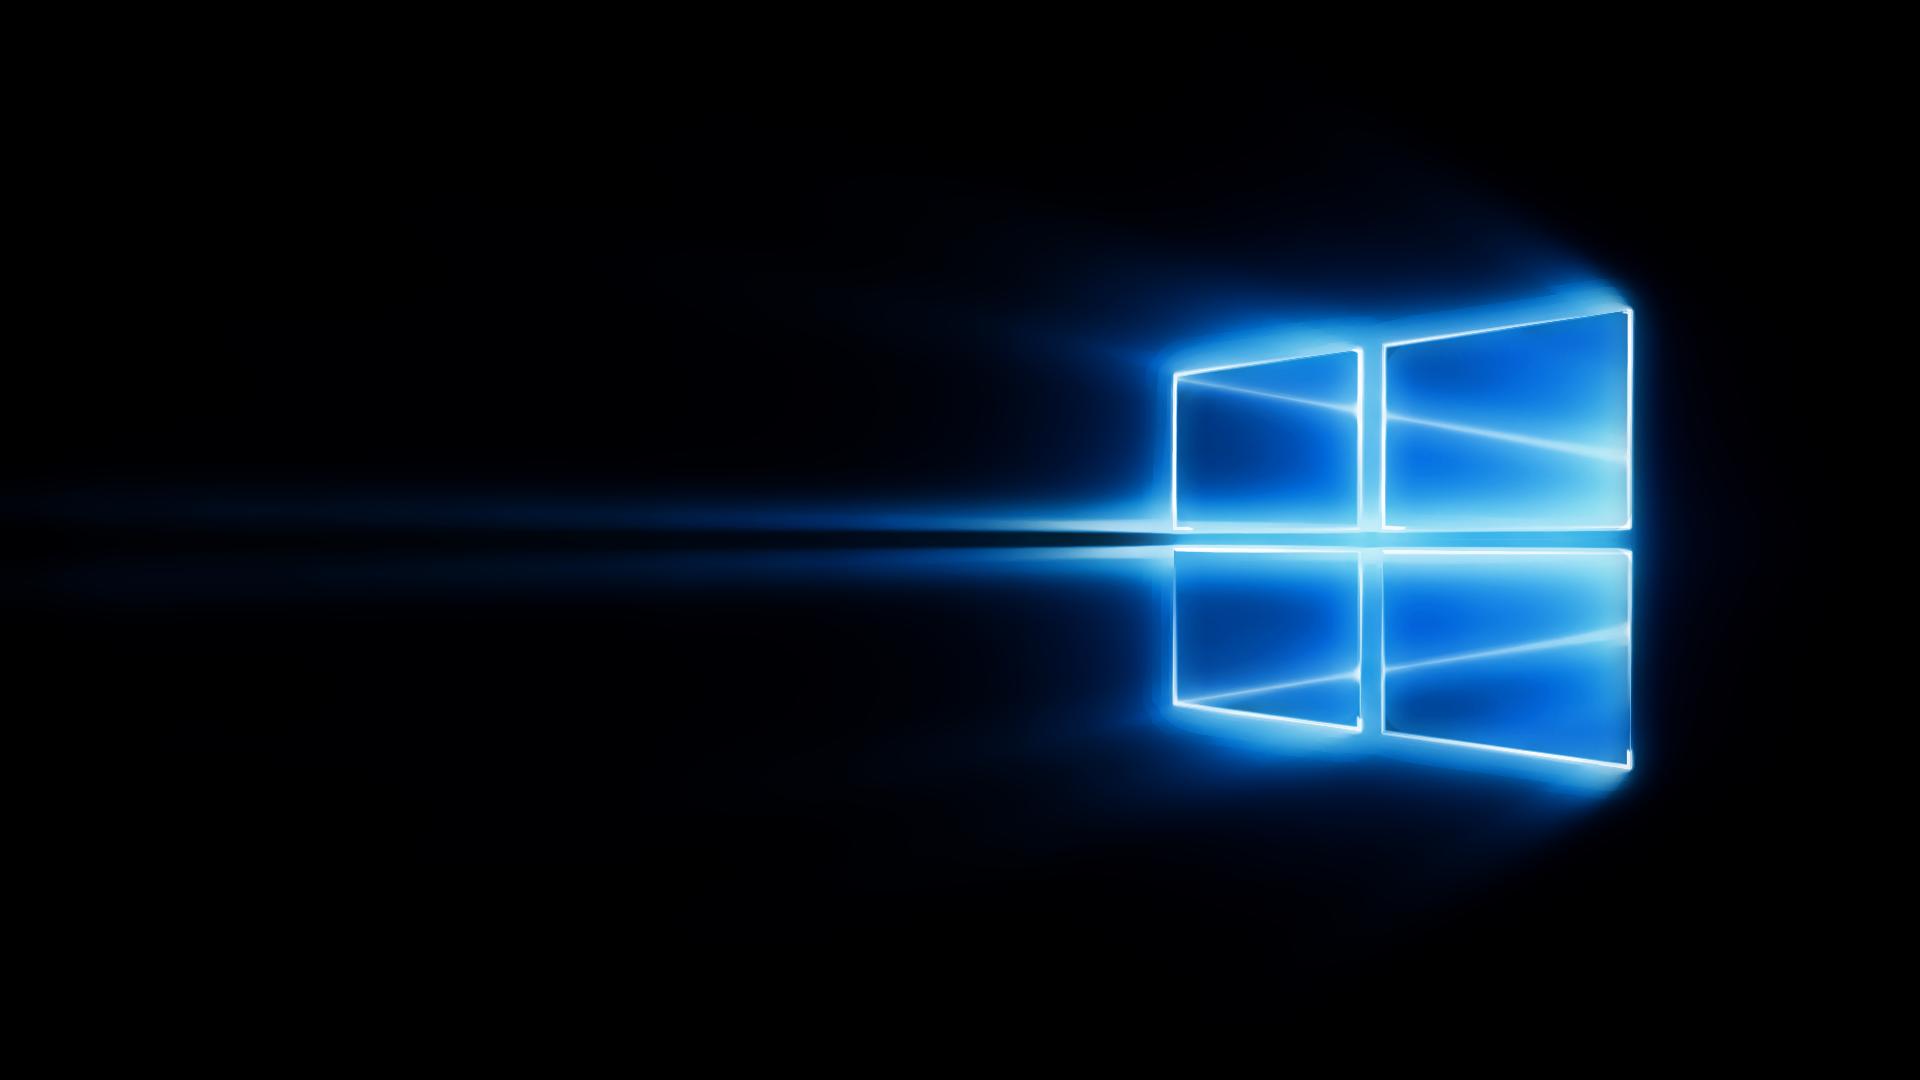 Unduh 46 Wallpaper Hd Windows Hd Terbaru Wallpaper Hd Wallpaper 3d Windows 10